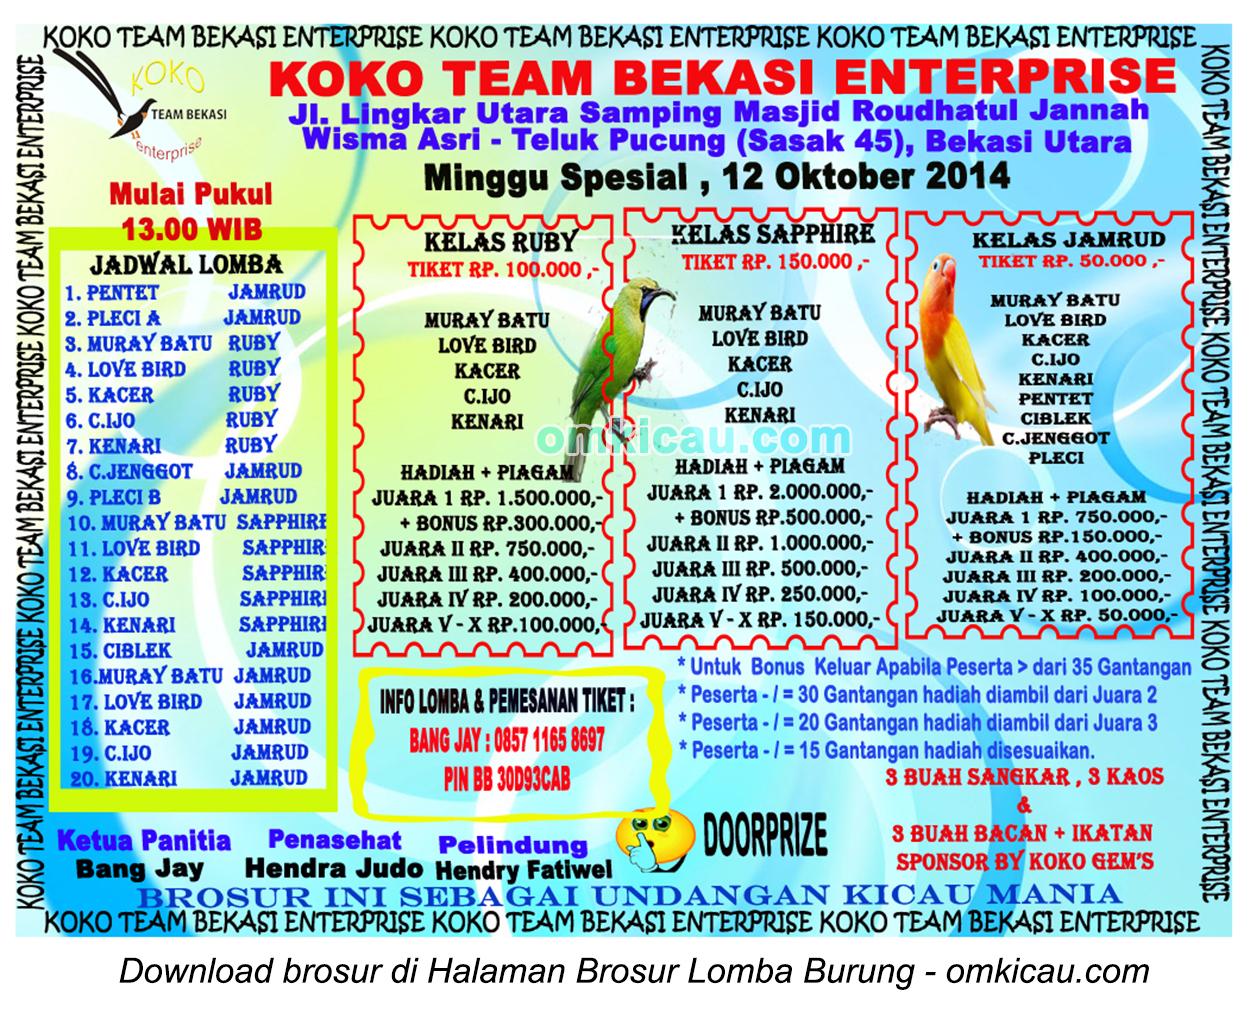 Brosur Latpres Spesial Koko Team Enterprise, Bekasi Utara, 12 Oktober 2014